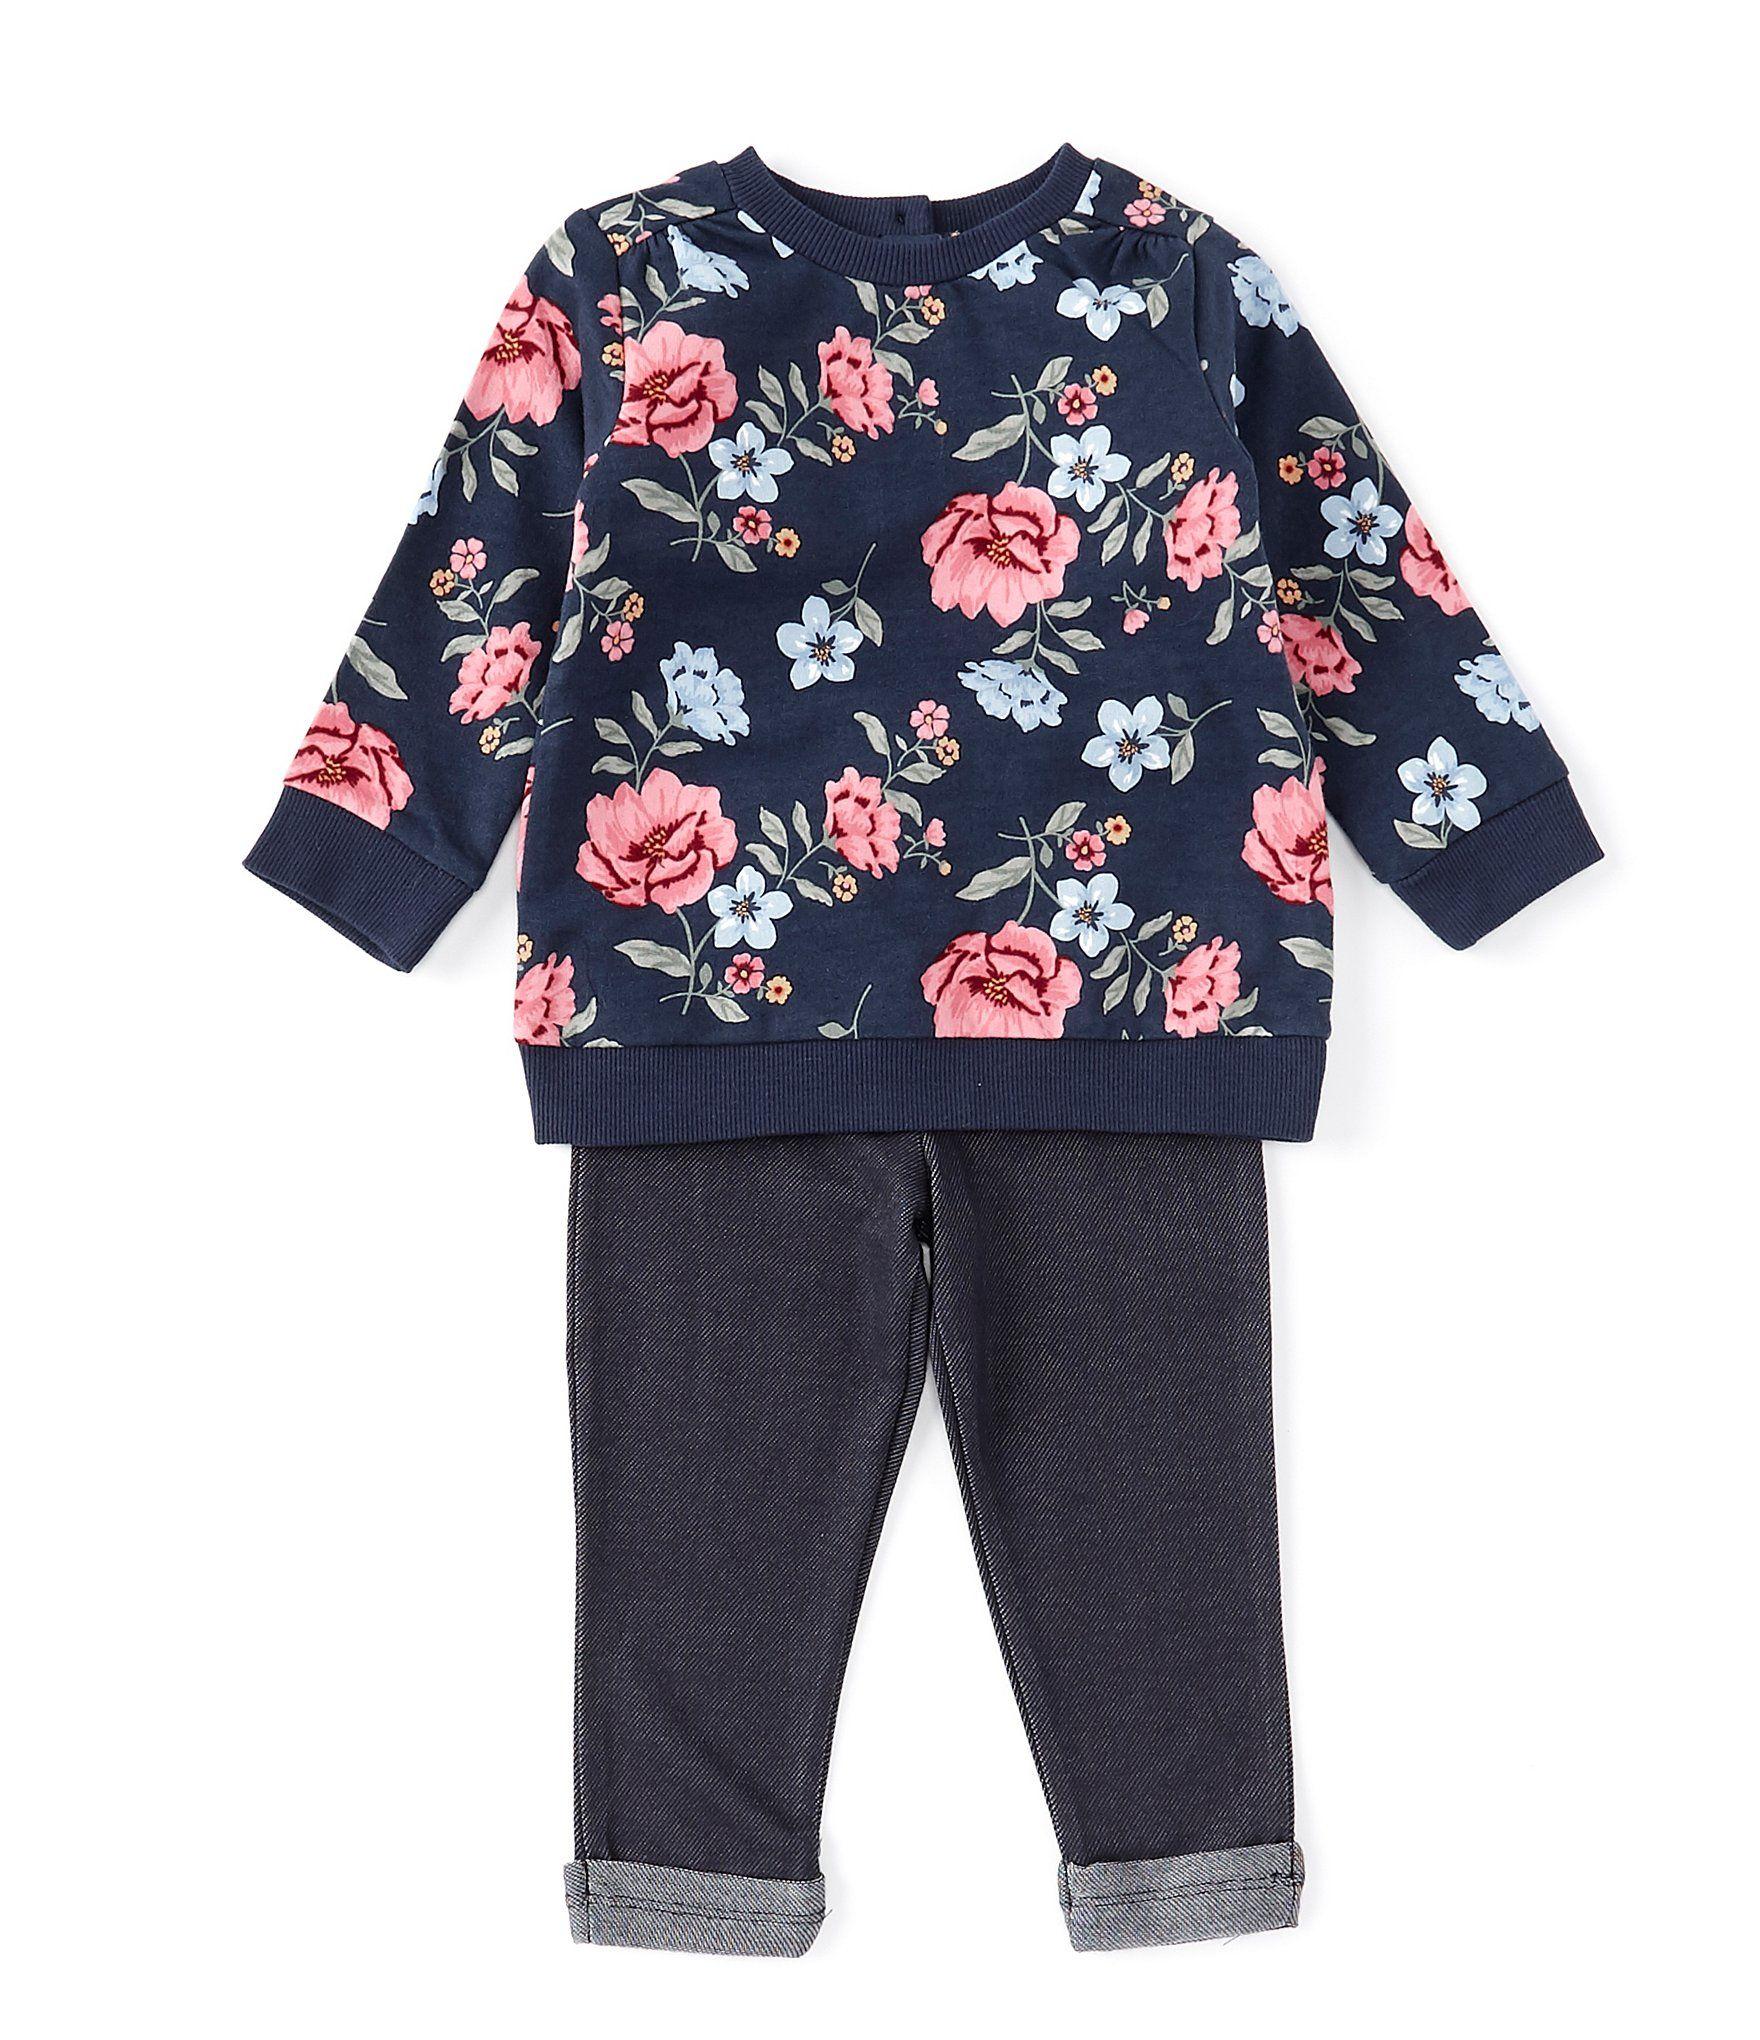 Photo of Little Me Baby Girls 12-24 Months Floral-Printed Sweatshirt & Knit Denim Leggings | Dillard's